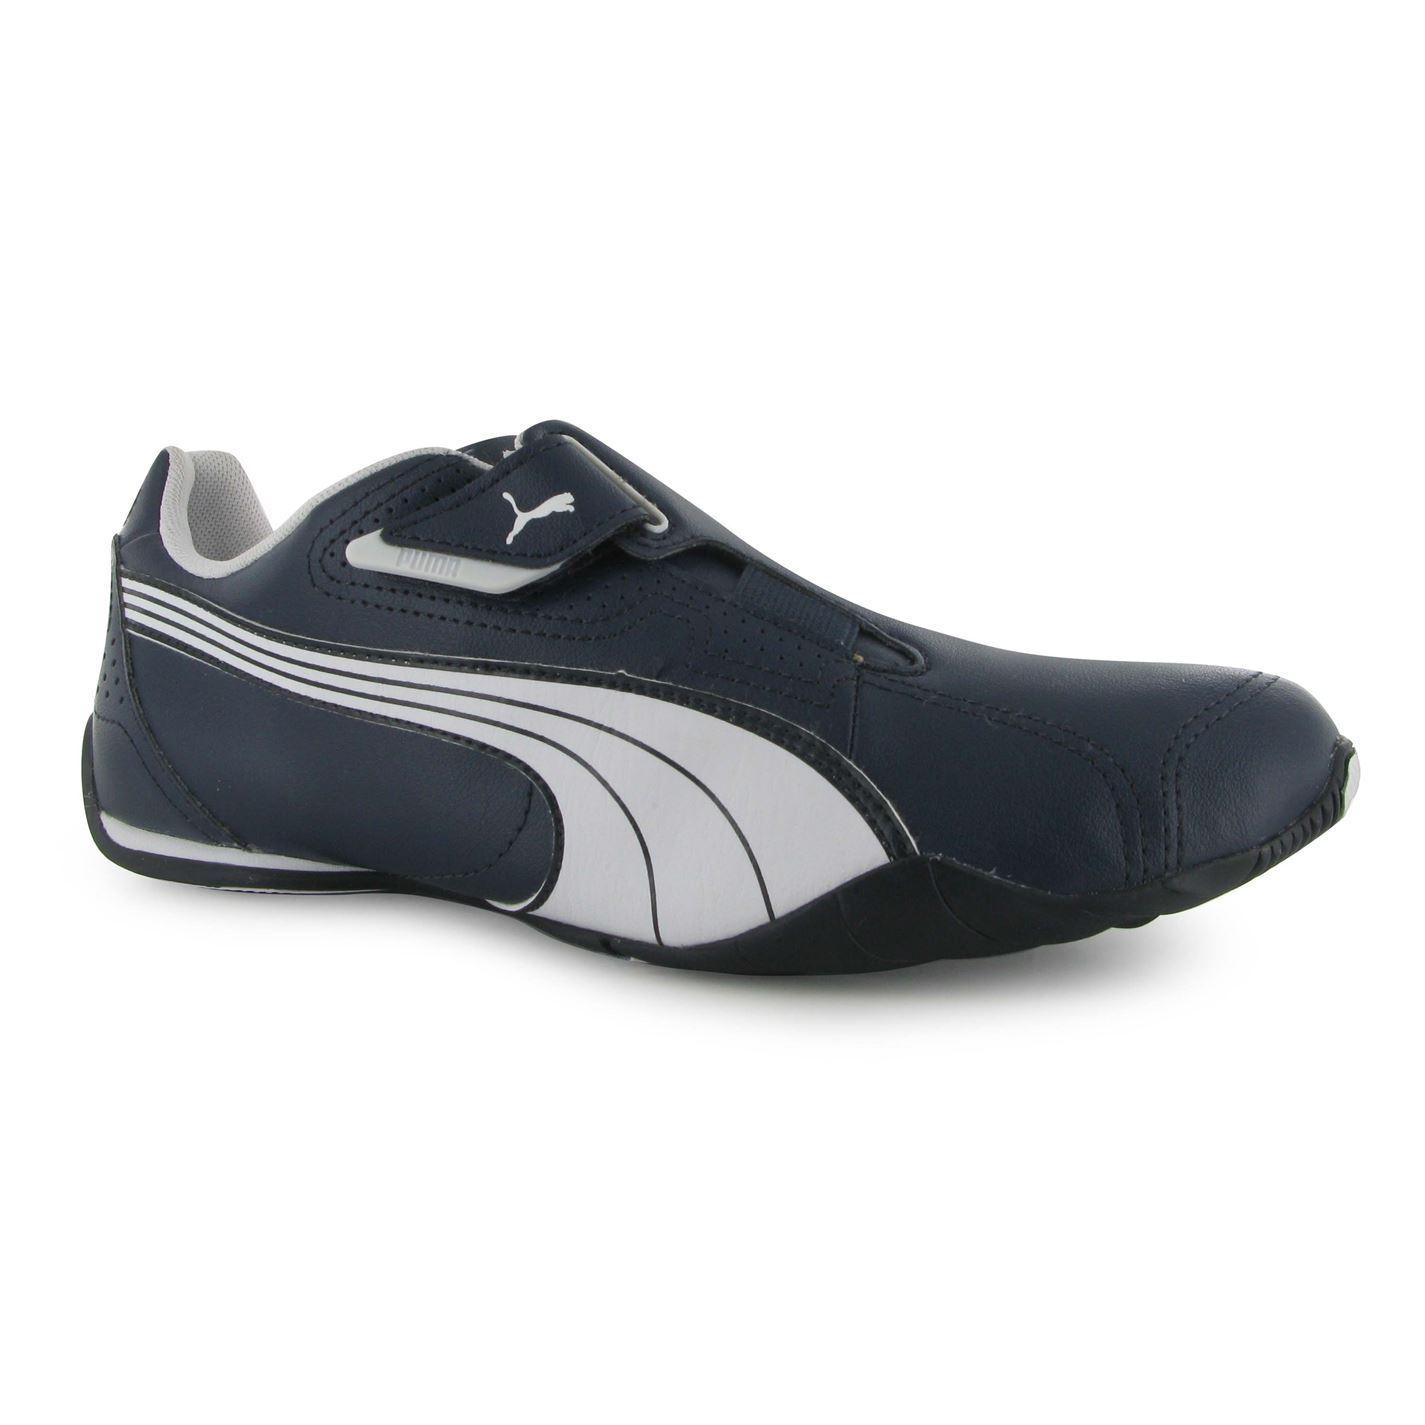 Puma Velcro Running Shoes